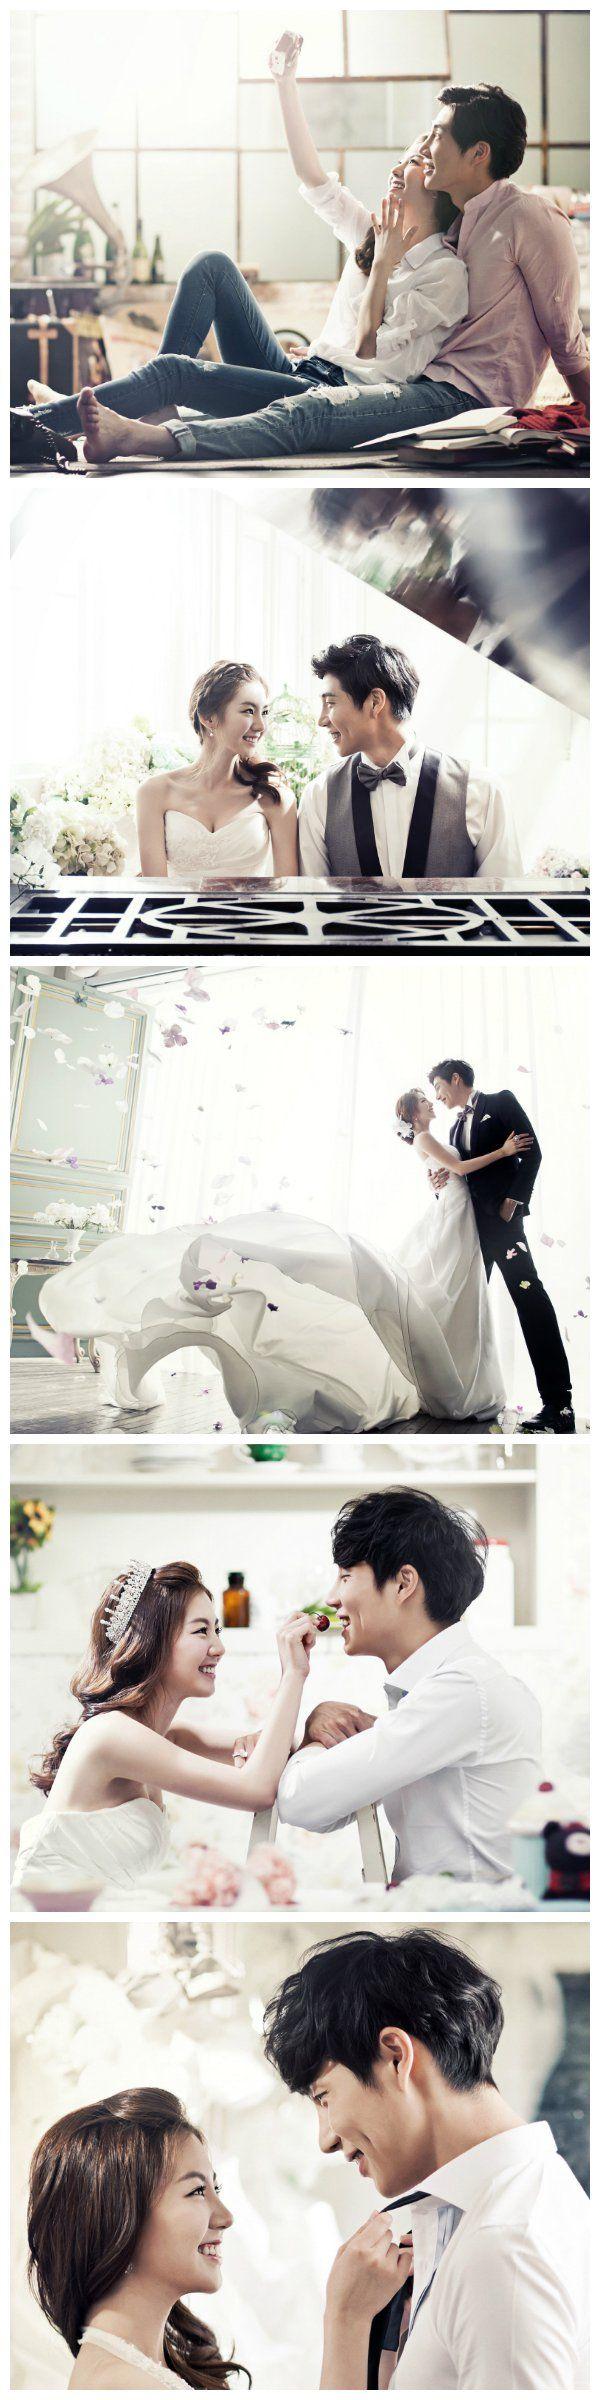 Korean pre-wedding photography in studio   May Studio on www.onethreeonefour.com